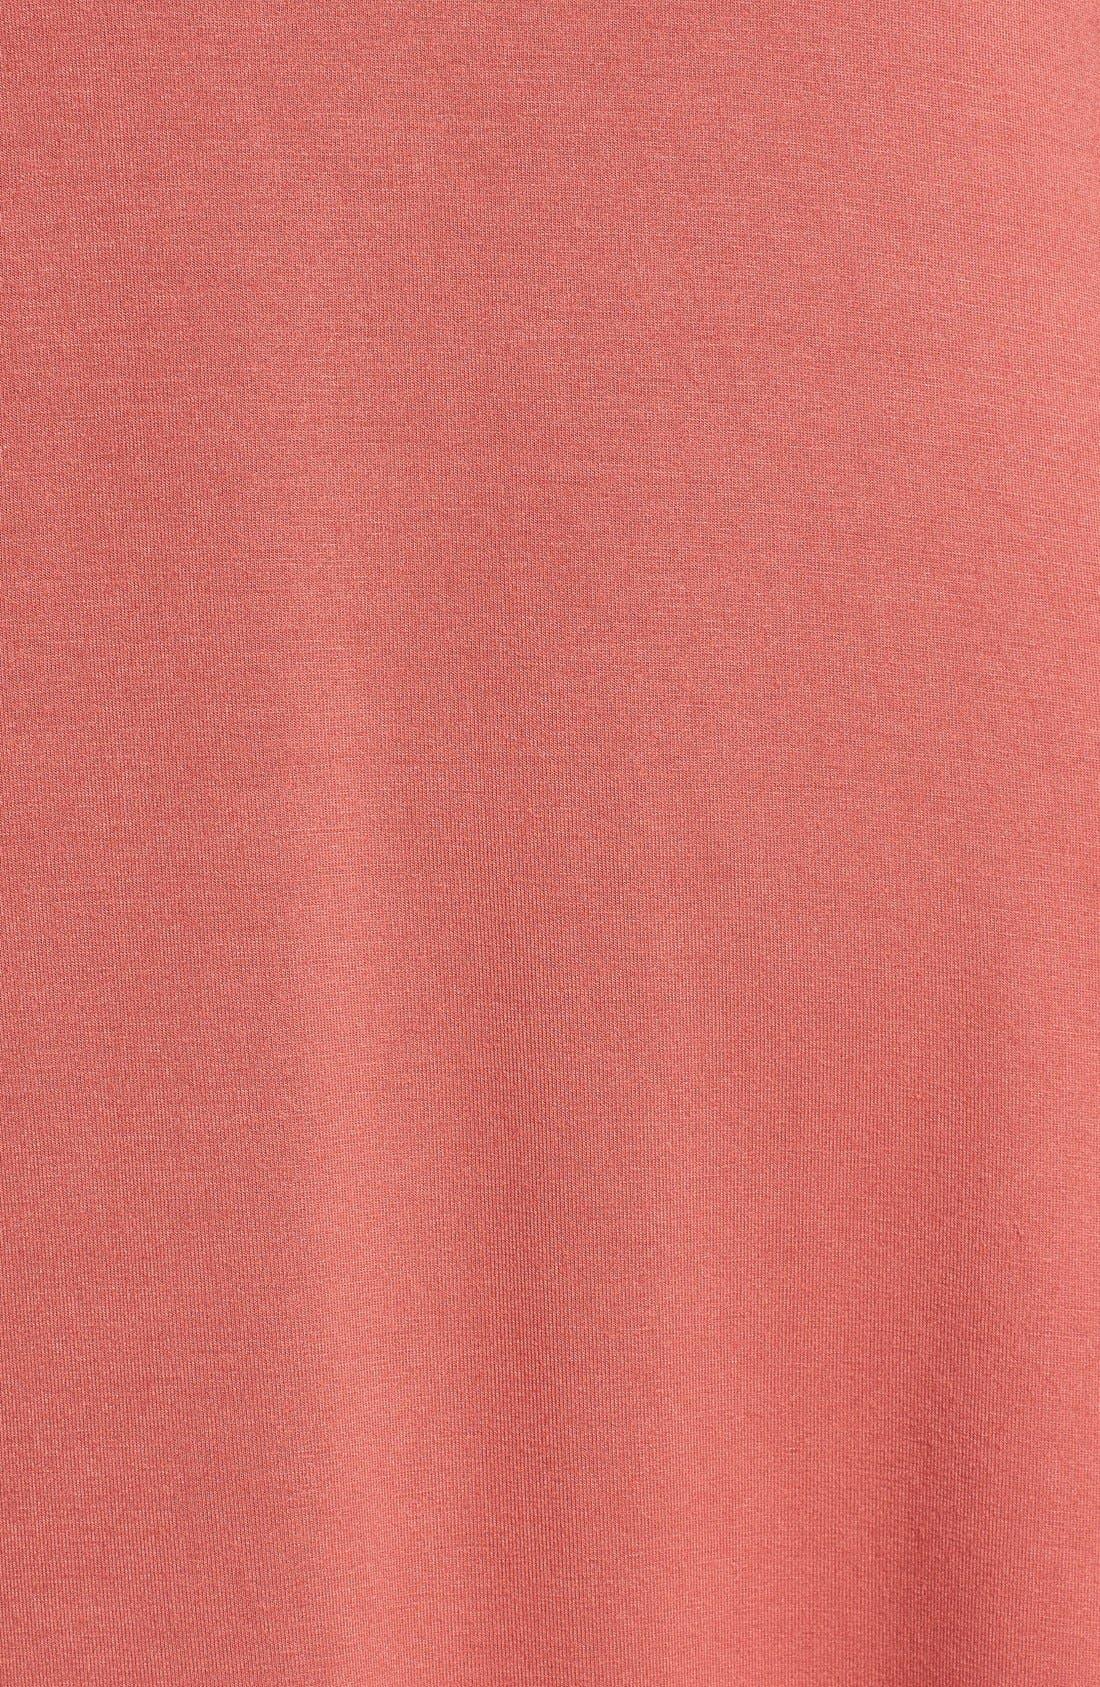 Cowl Neck Shift Dress,                             Alternate thumbnail 69, color,